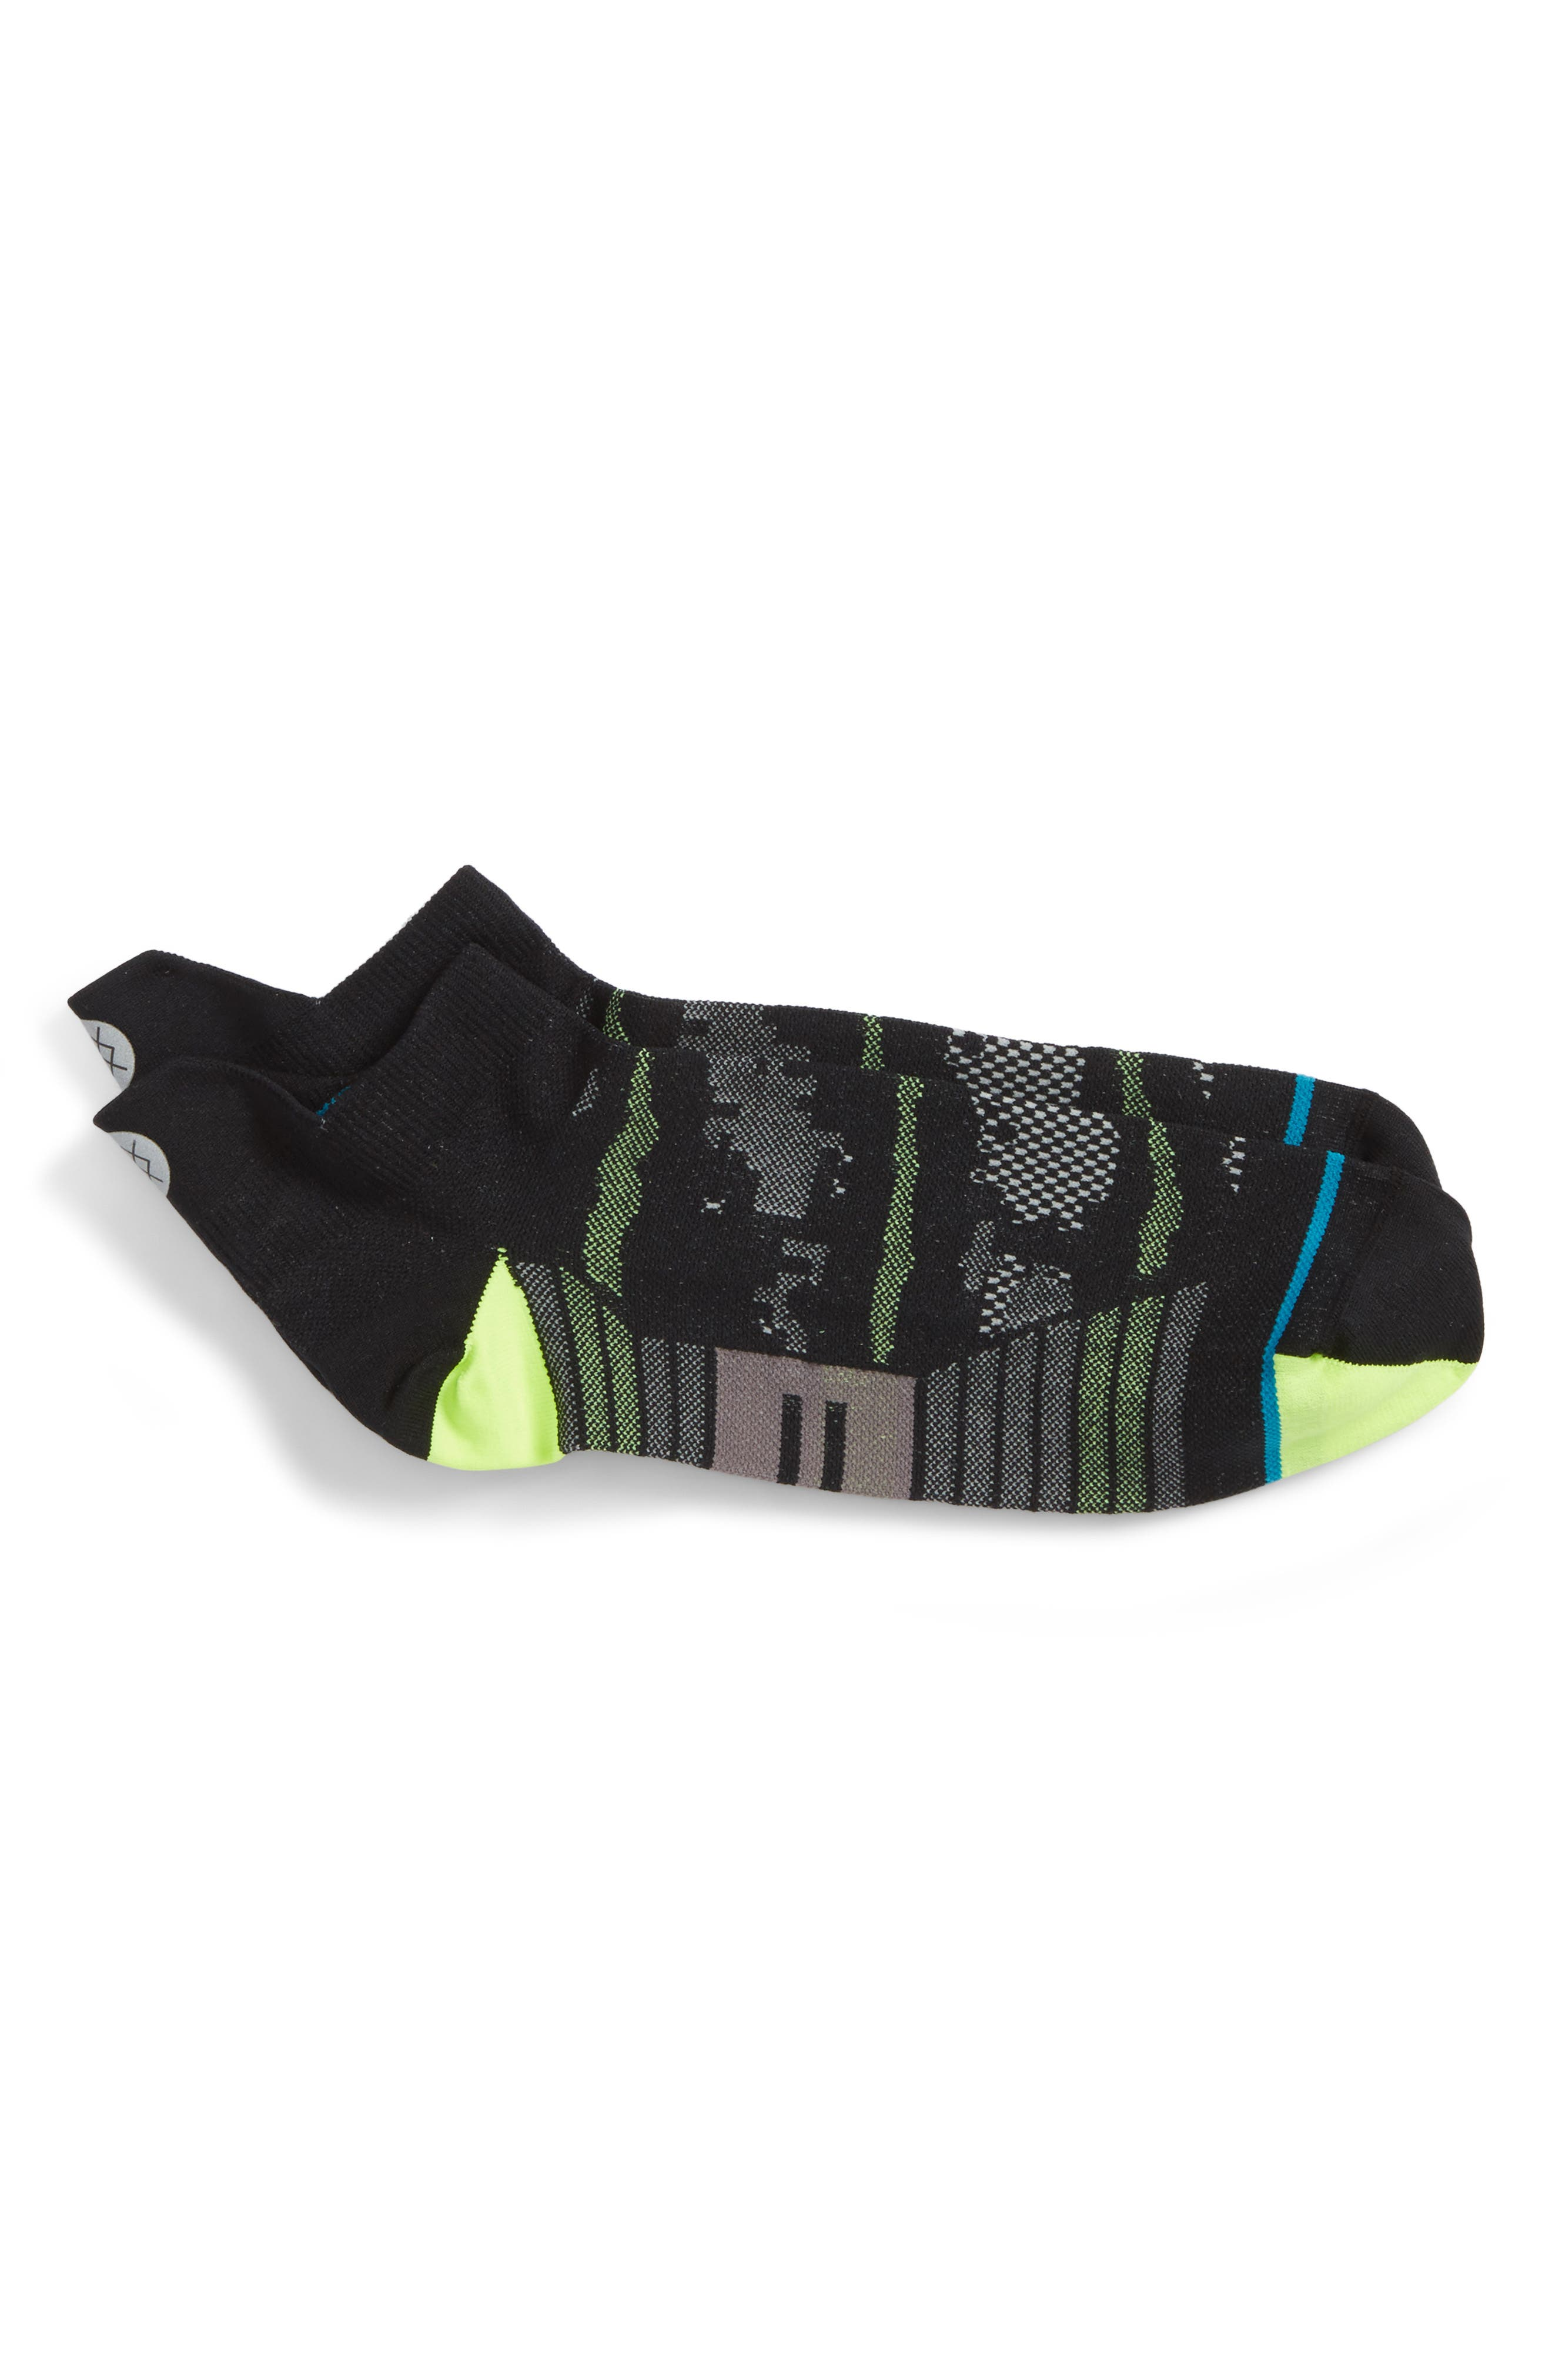 Night Light Tab Socks,                         Main,                         color, Black